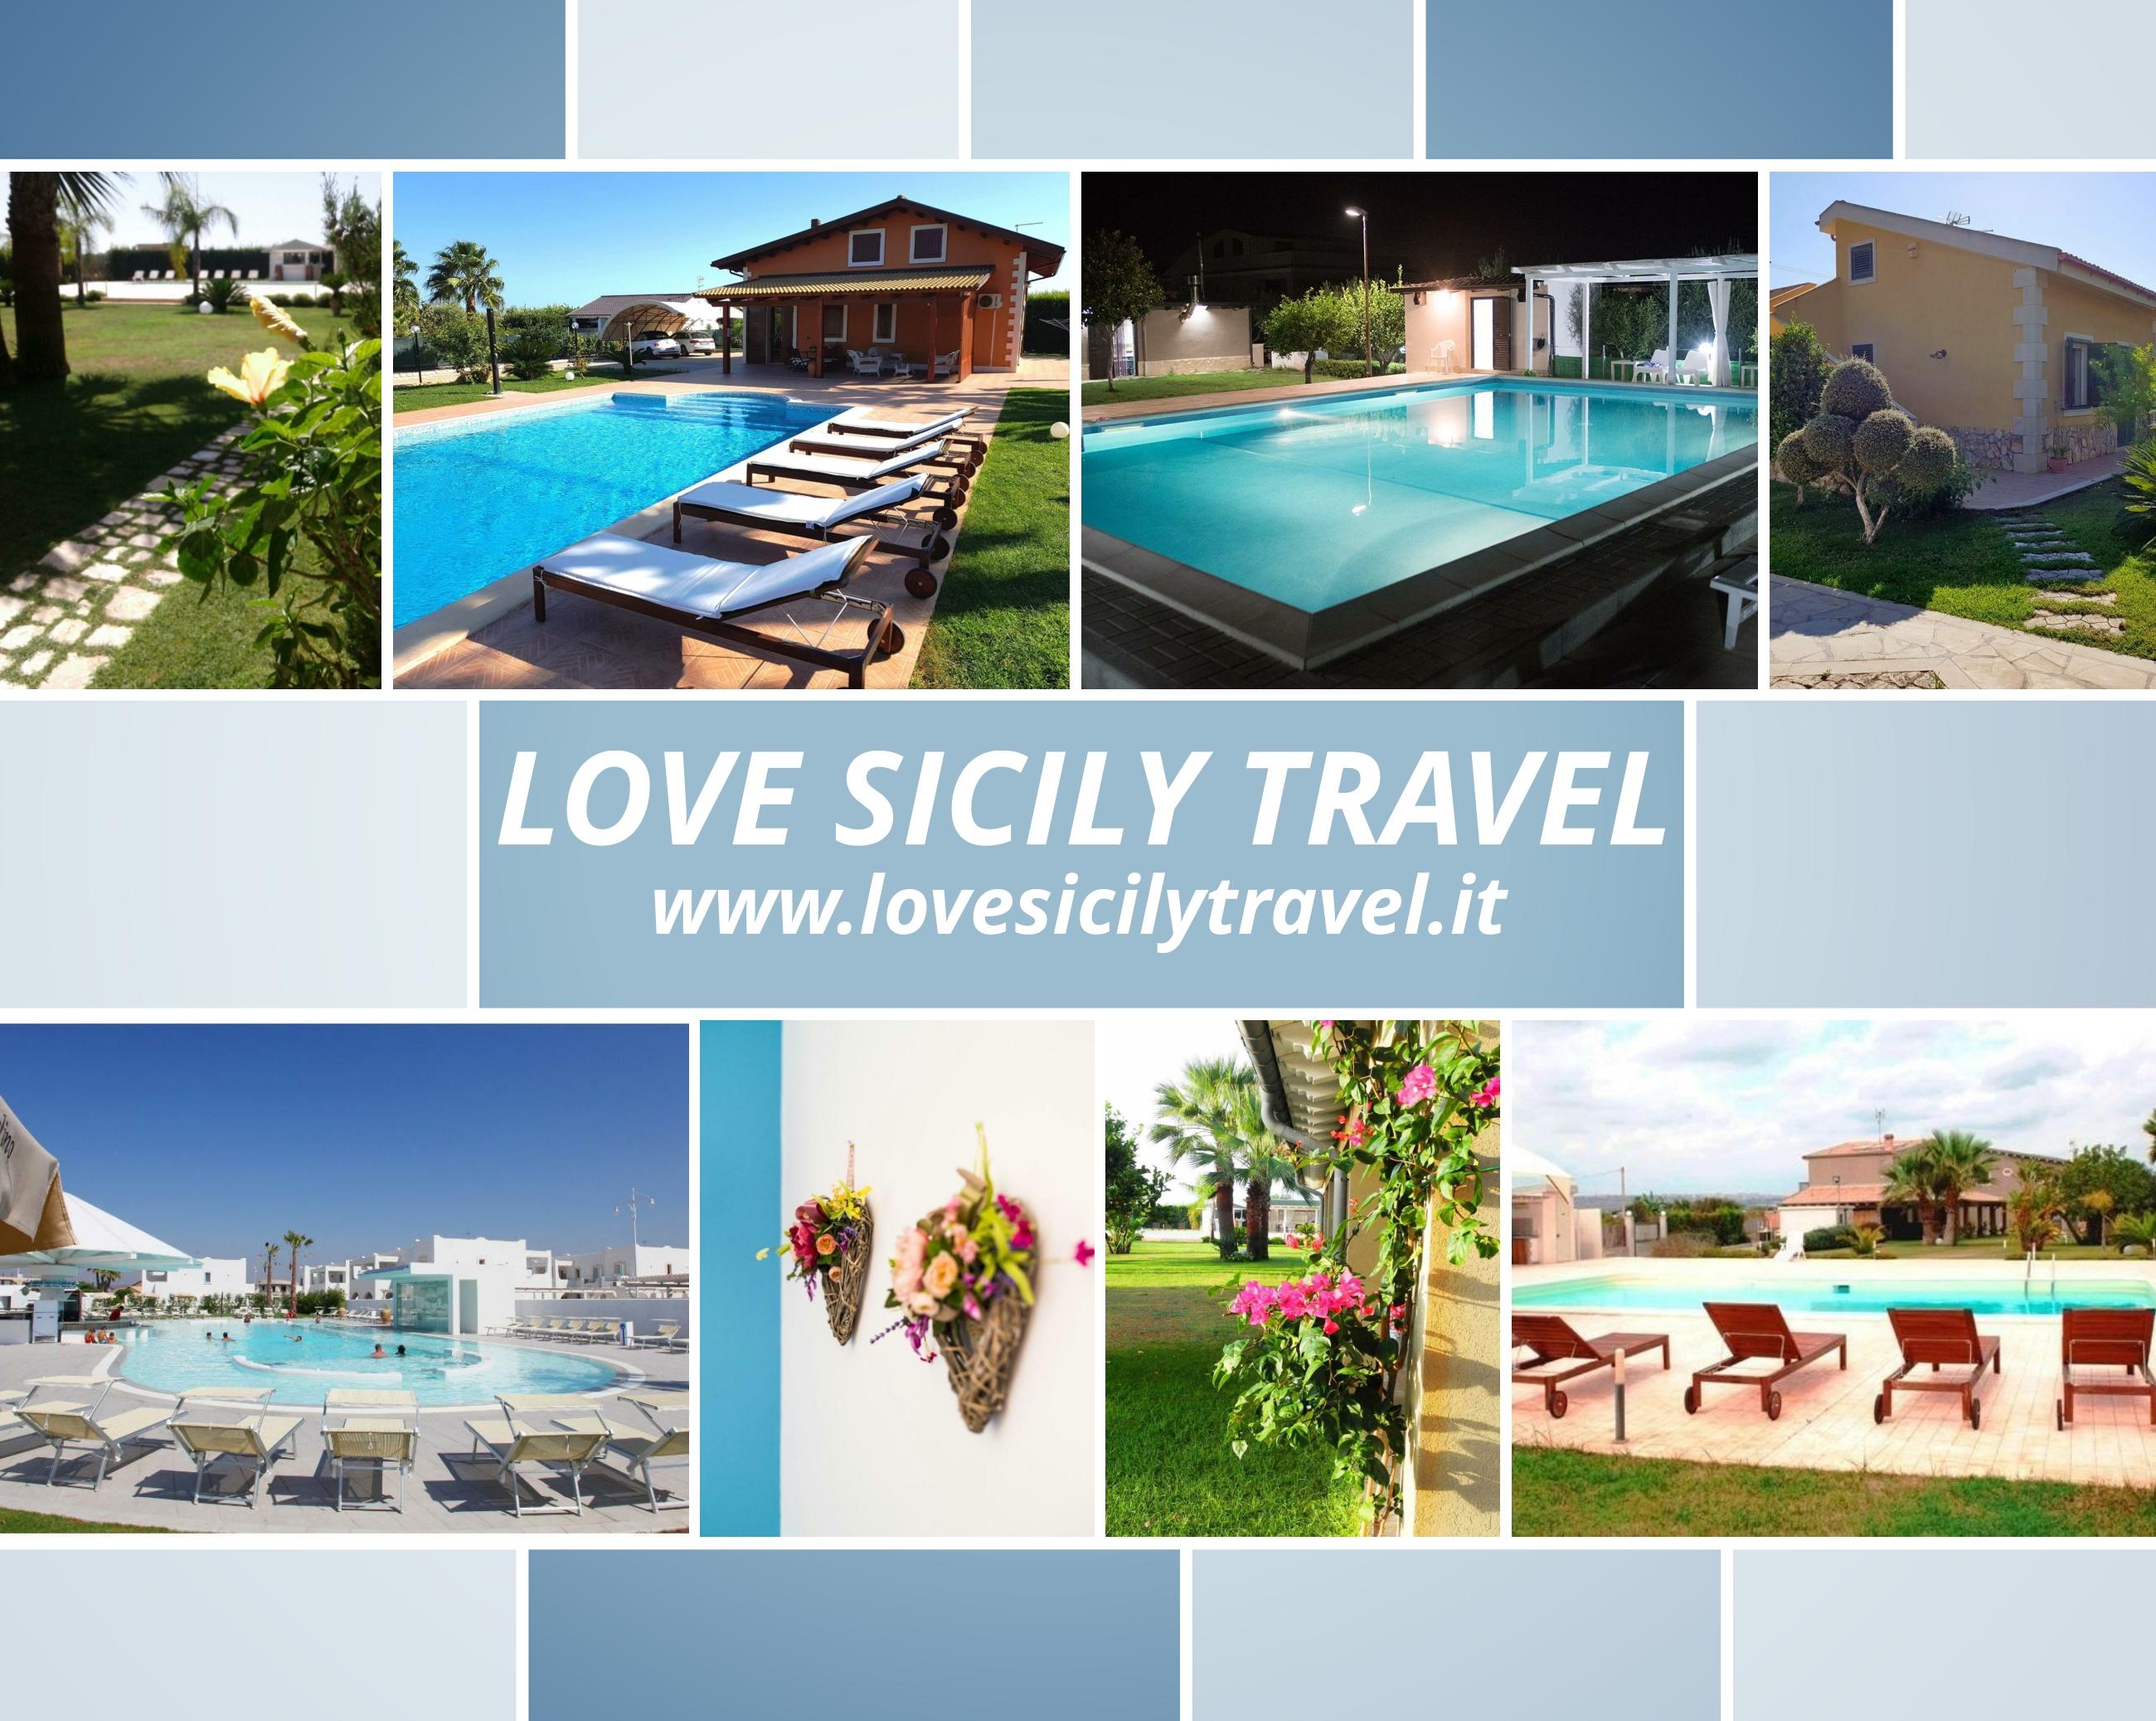 Love Sicily Travel